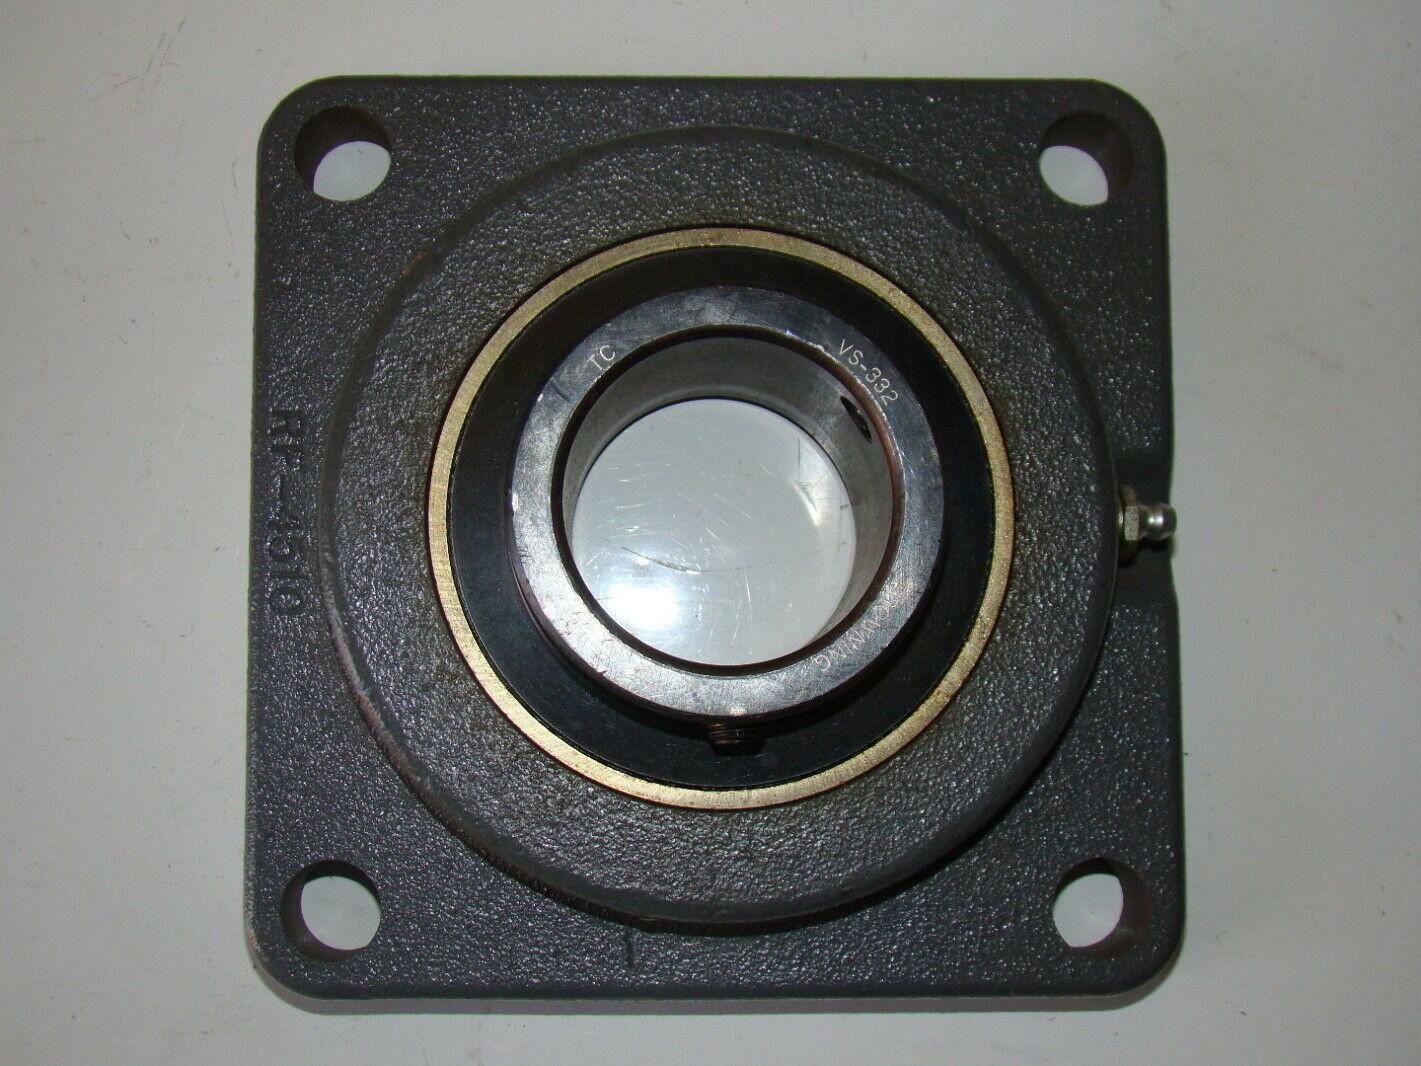 Browning Bearing Unit VS 332 eBay #6D664B